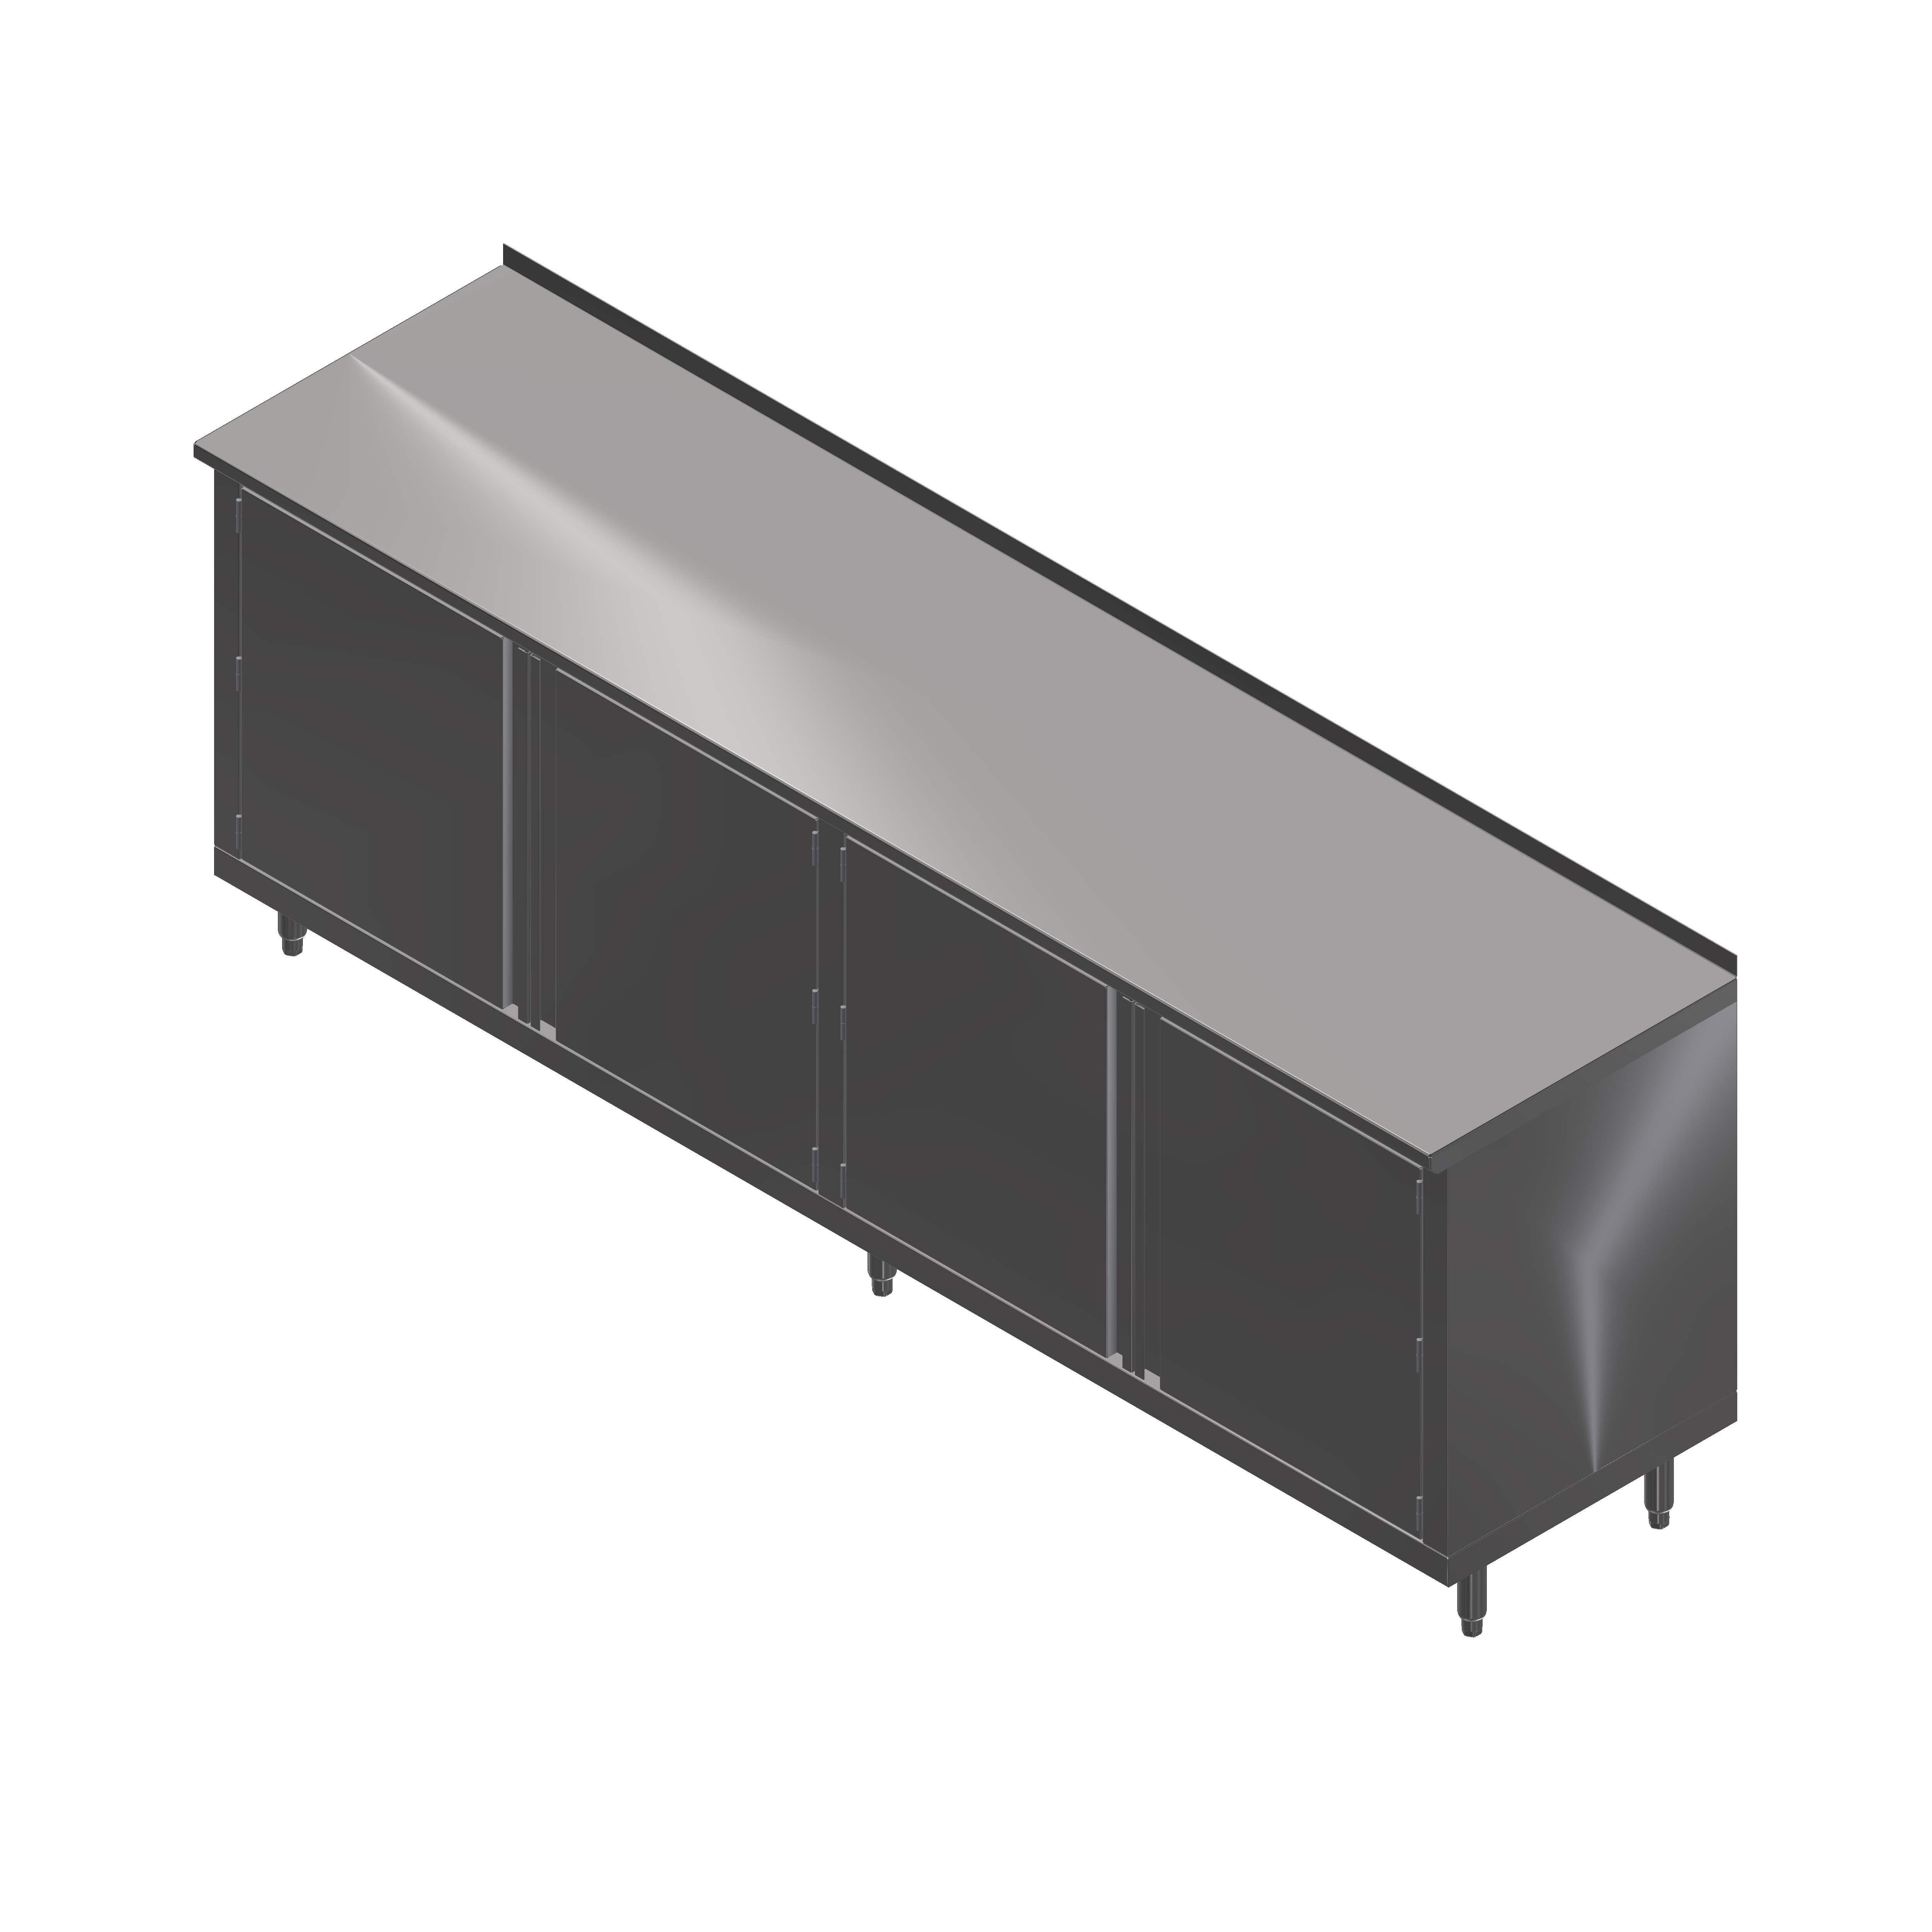 John Boos 4CH4R1.5-30132 work table, cabinet base hinged doors